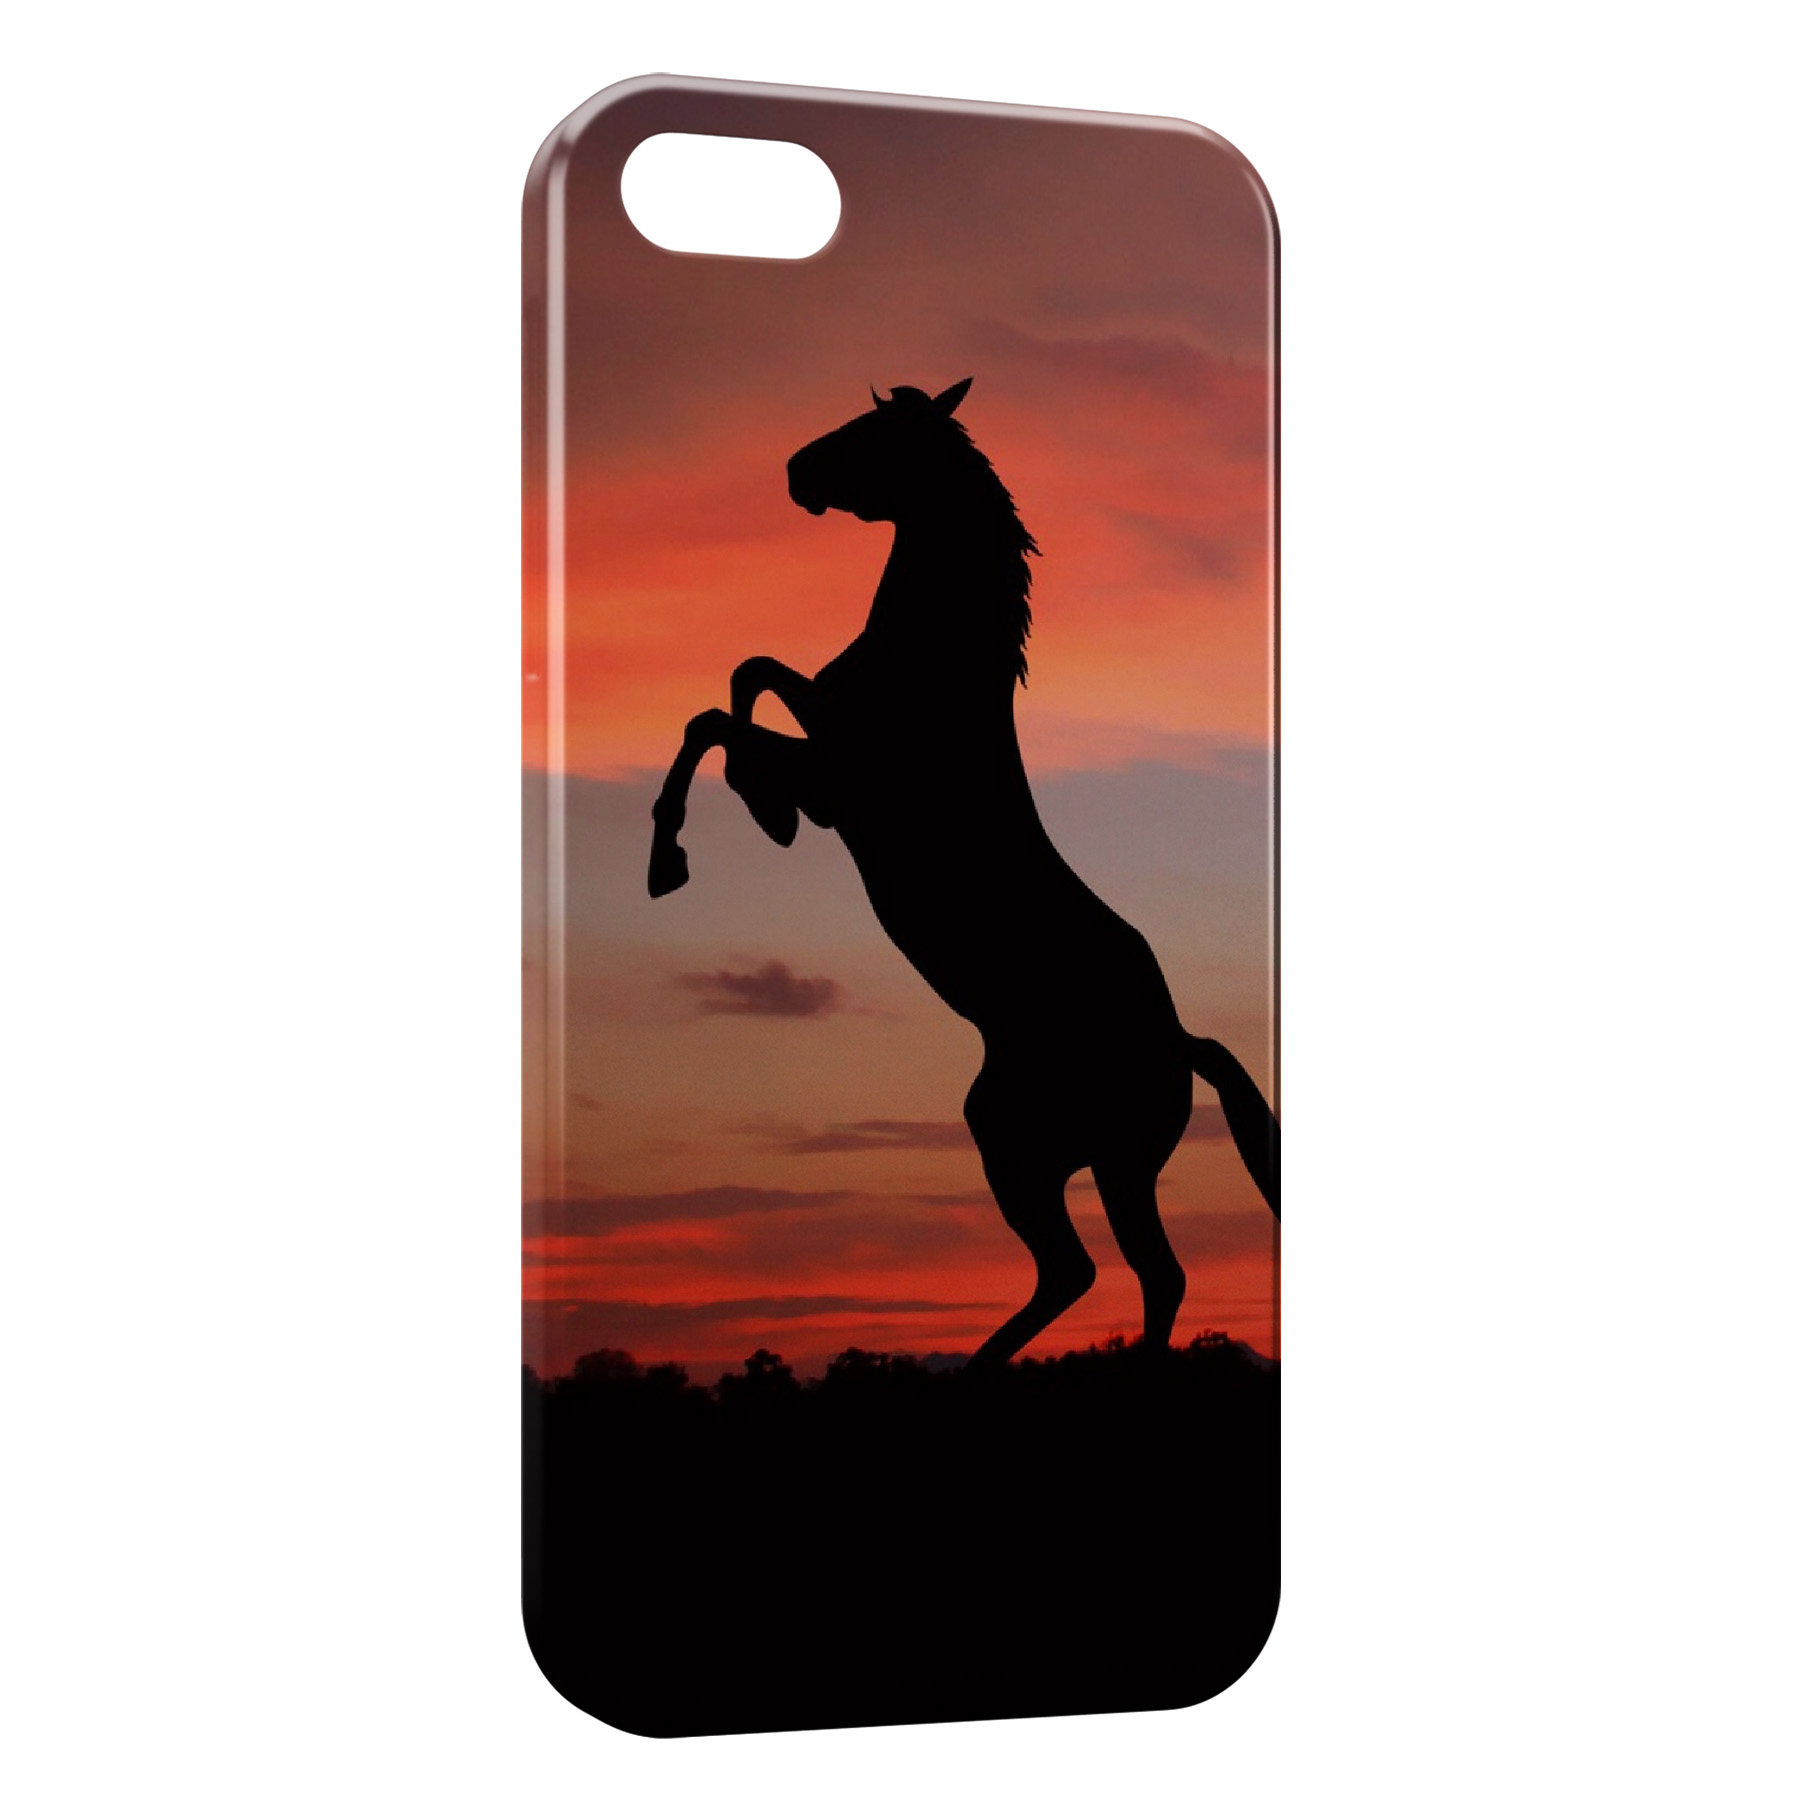 Coque iPhone 5C Cheval Cabré 2 Sunset